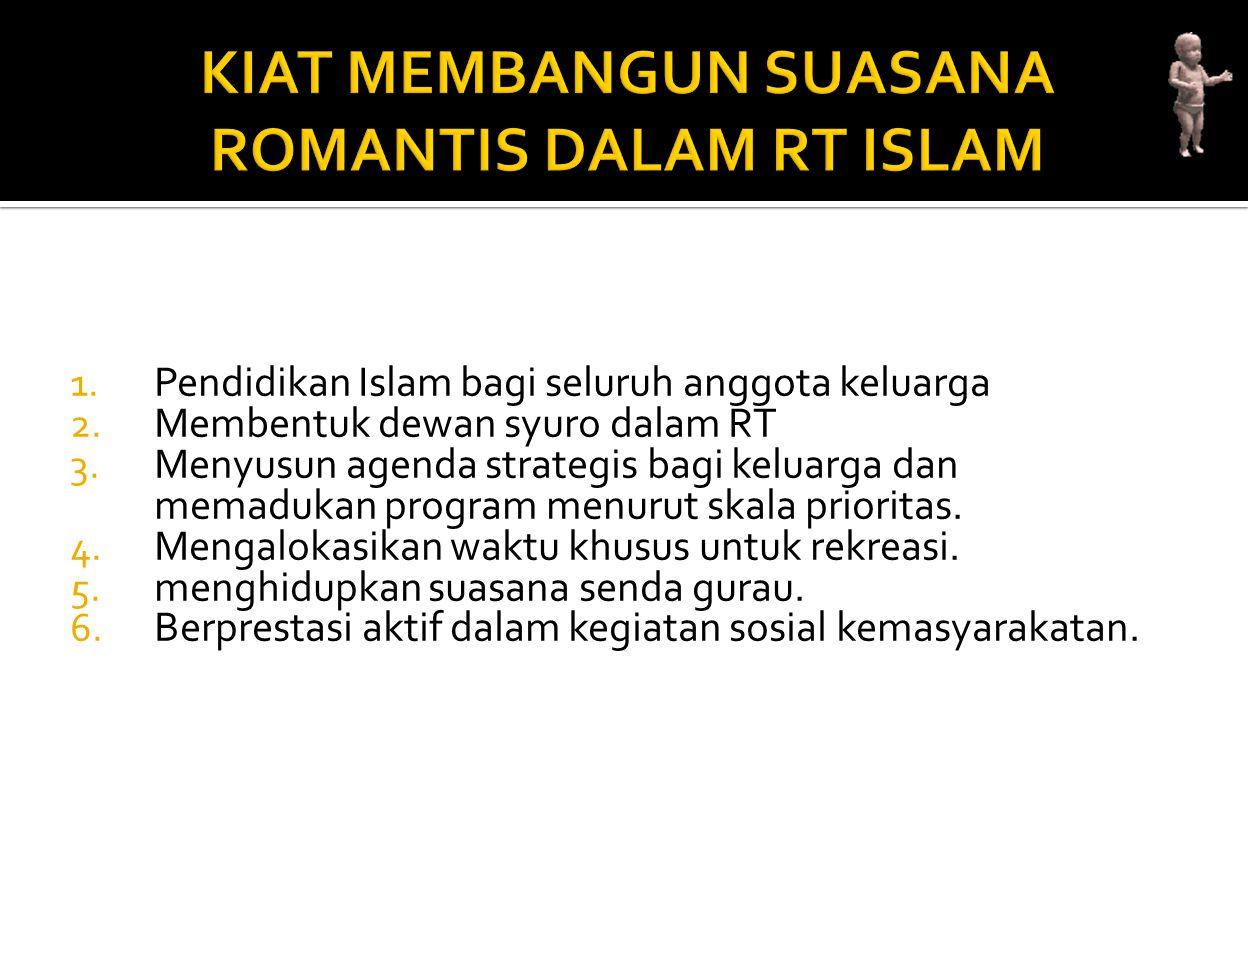 1. Pendidikan Islam bagi seluruh anggota keluarga 2. Membentuk dewan syuro dalam RT 3. Menyusun agenda strategis bagi keluarga dan memadukan program m